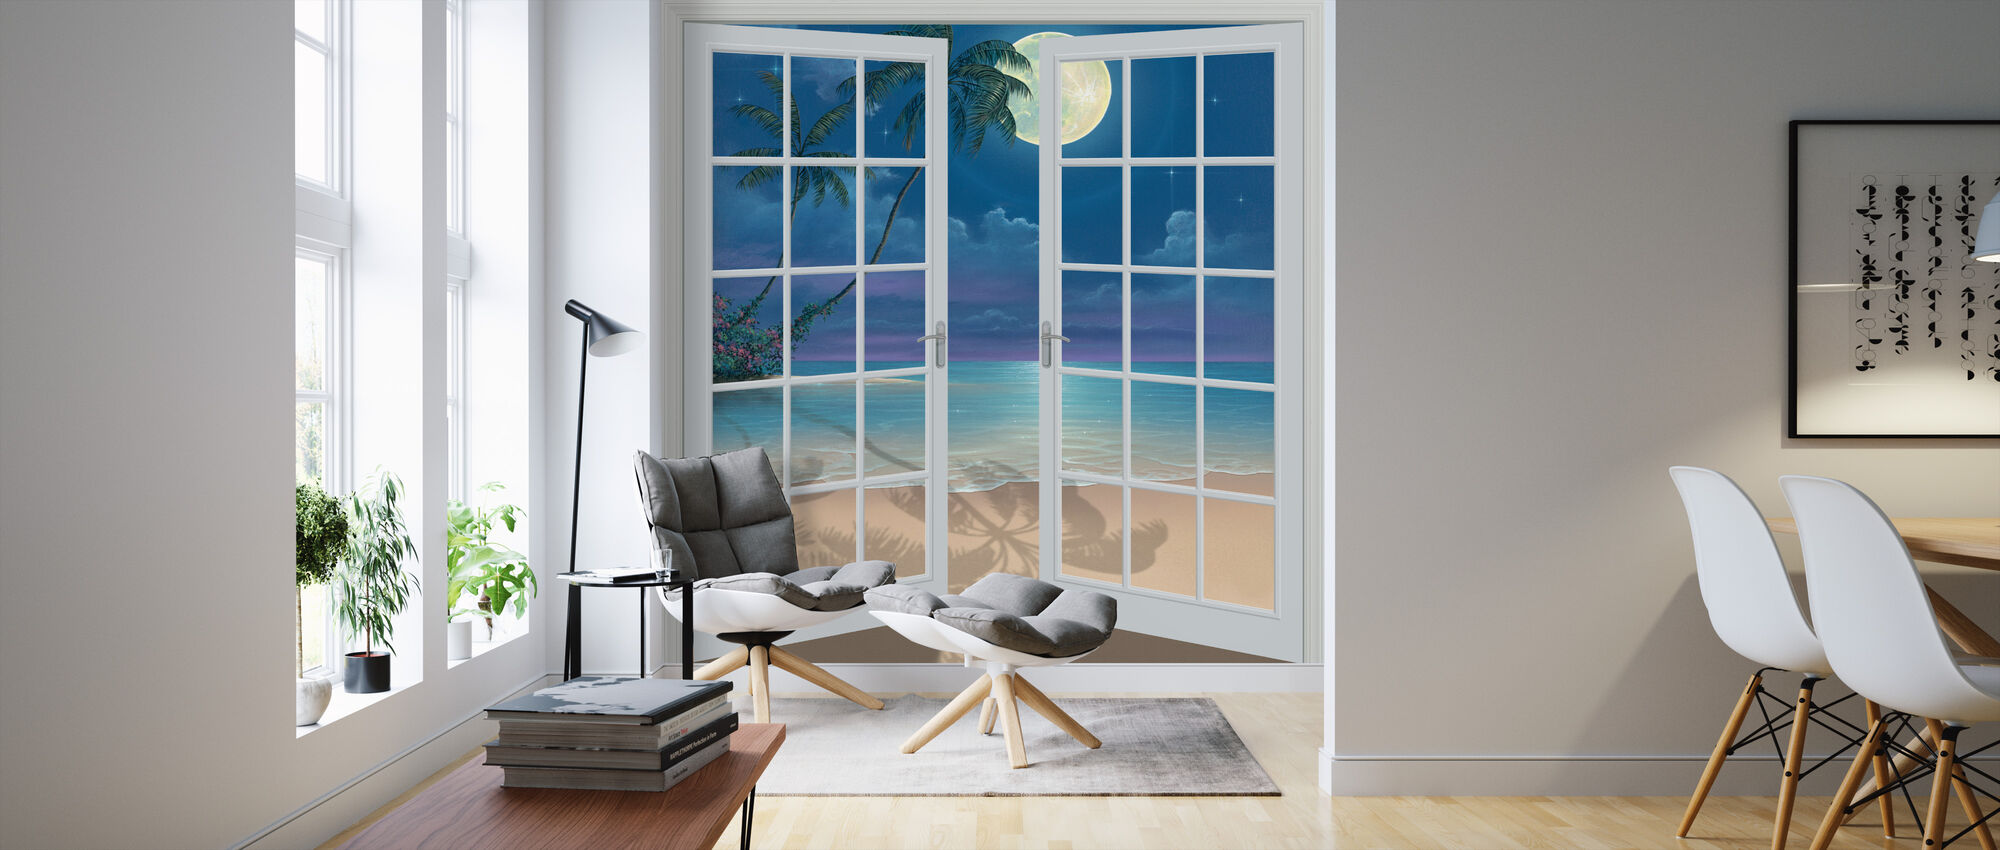 Månen skuggor - Tapet - Vardagsrum